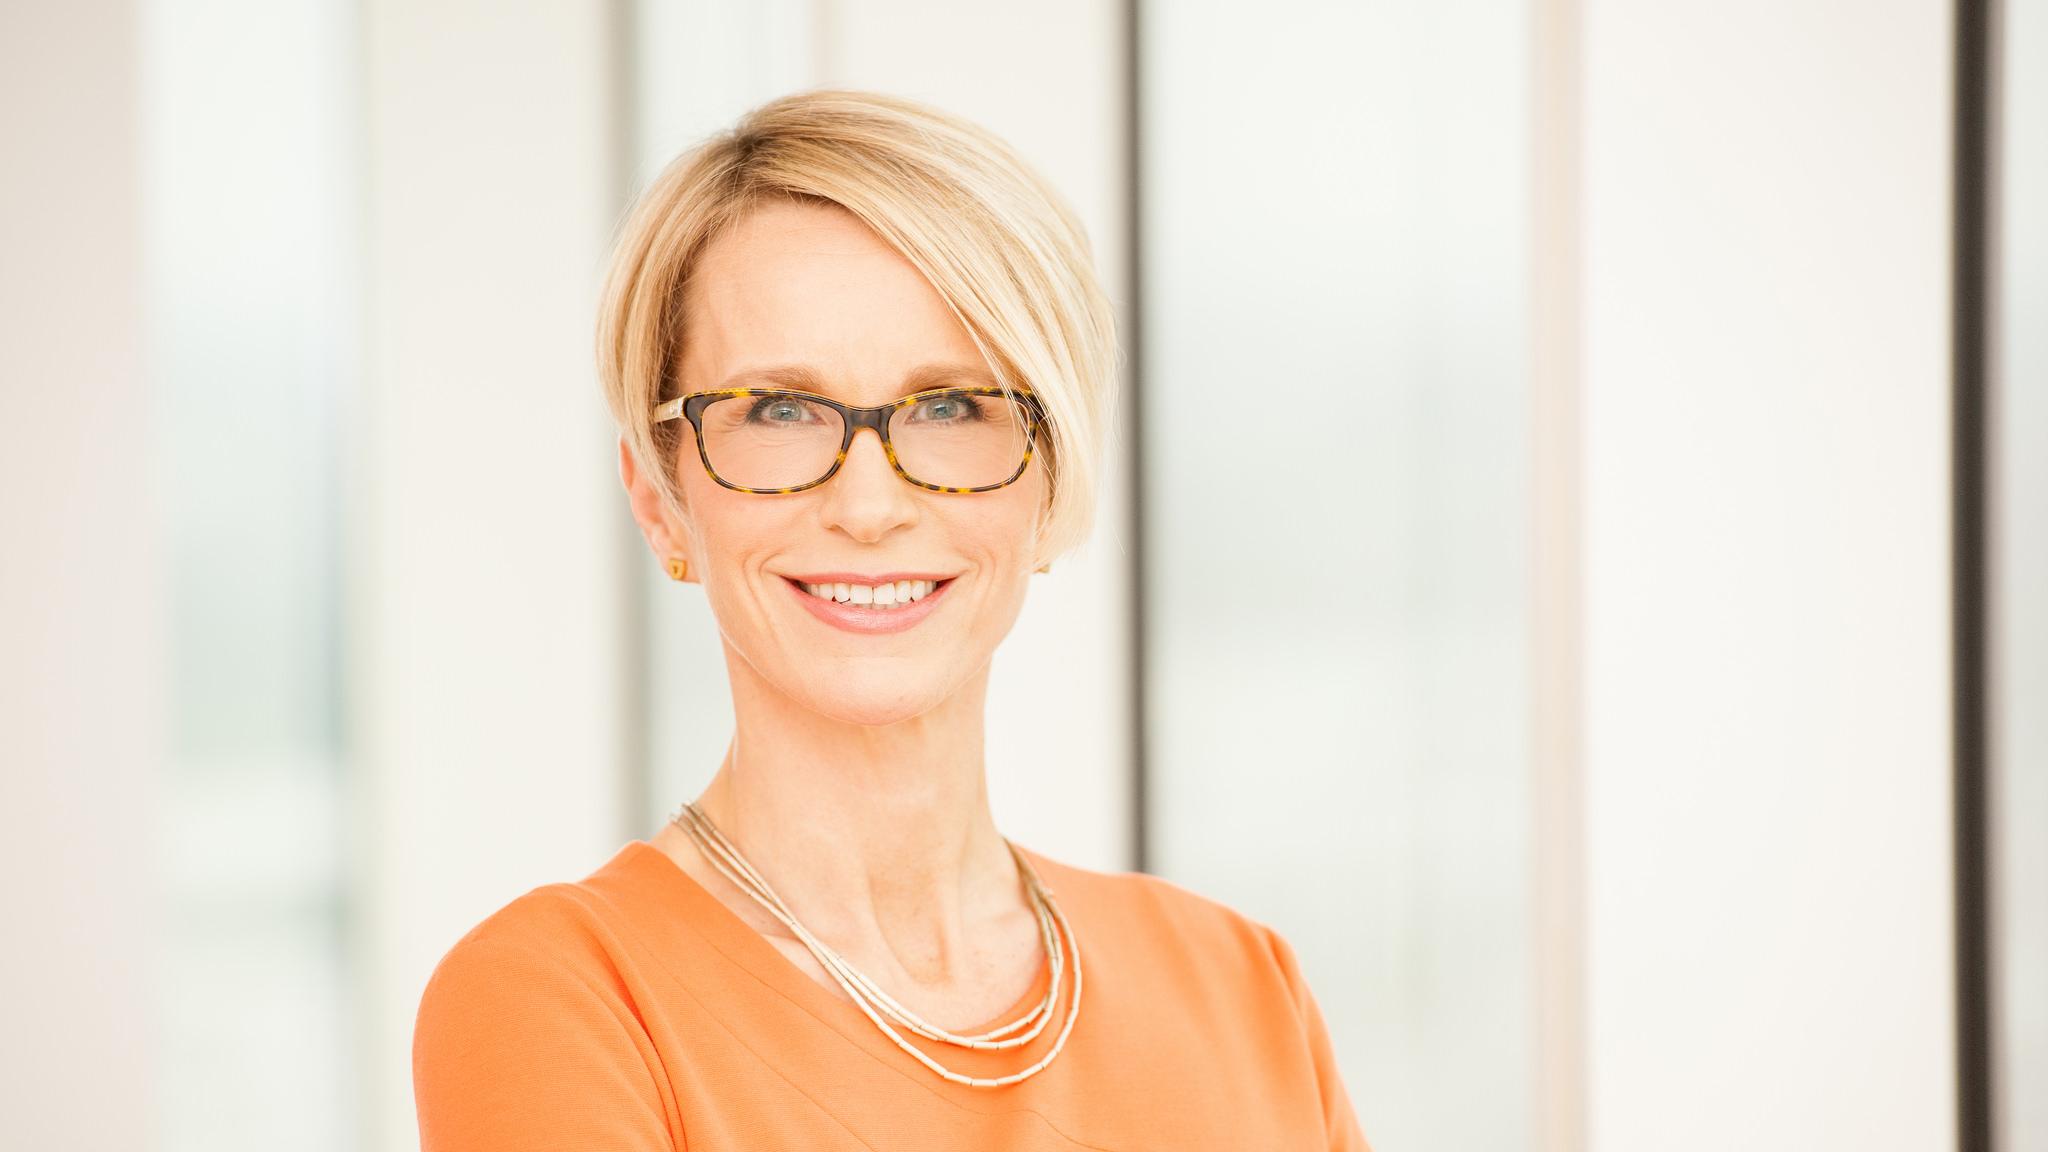 Emma Walmsley - Chief Executive Officer of GlaxoSmithKline